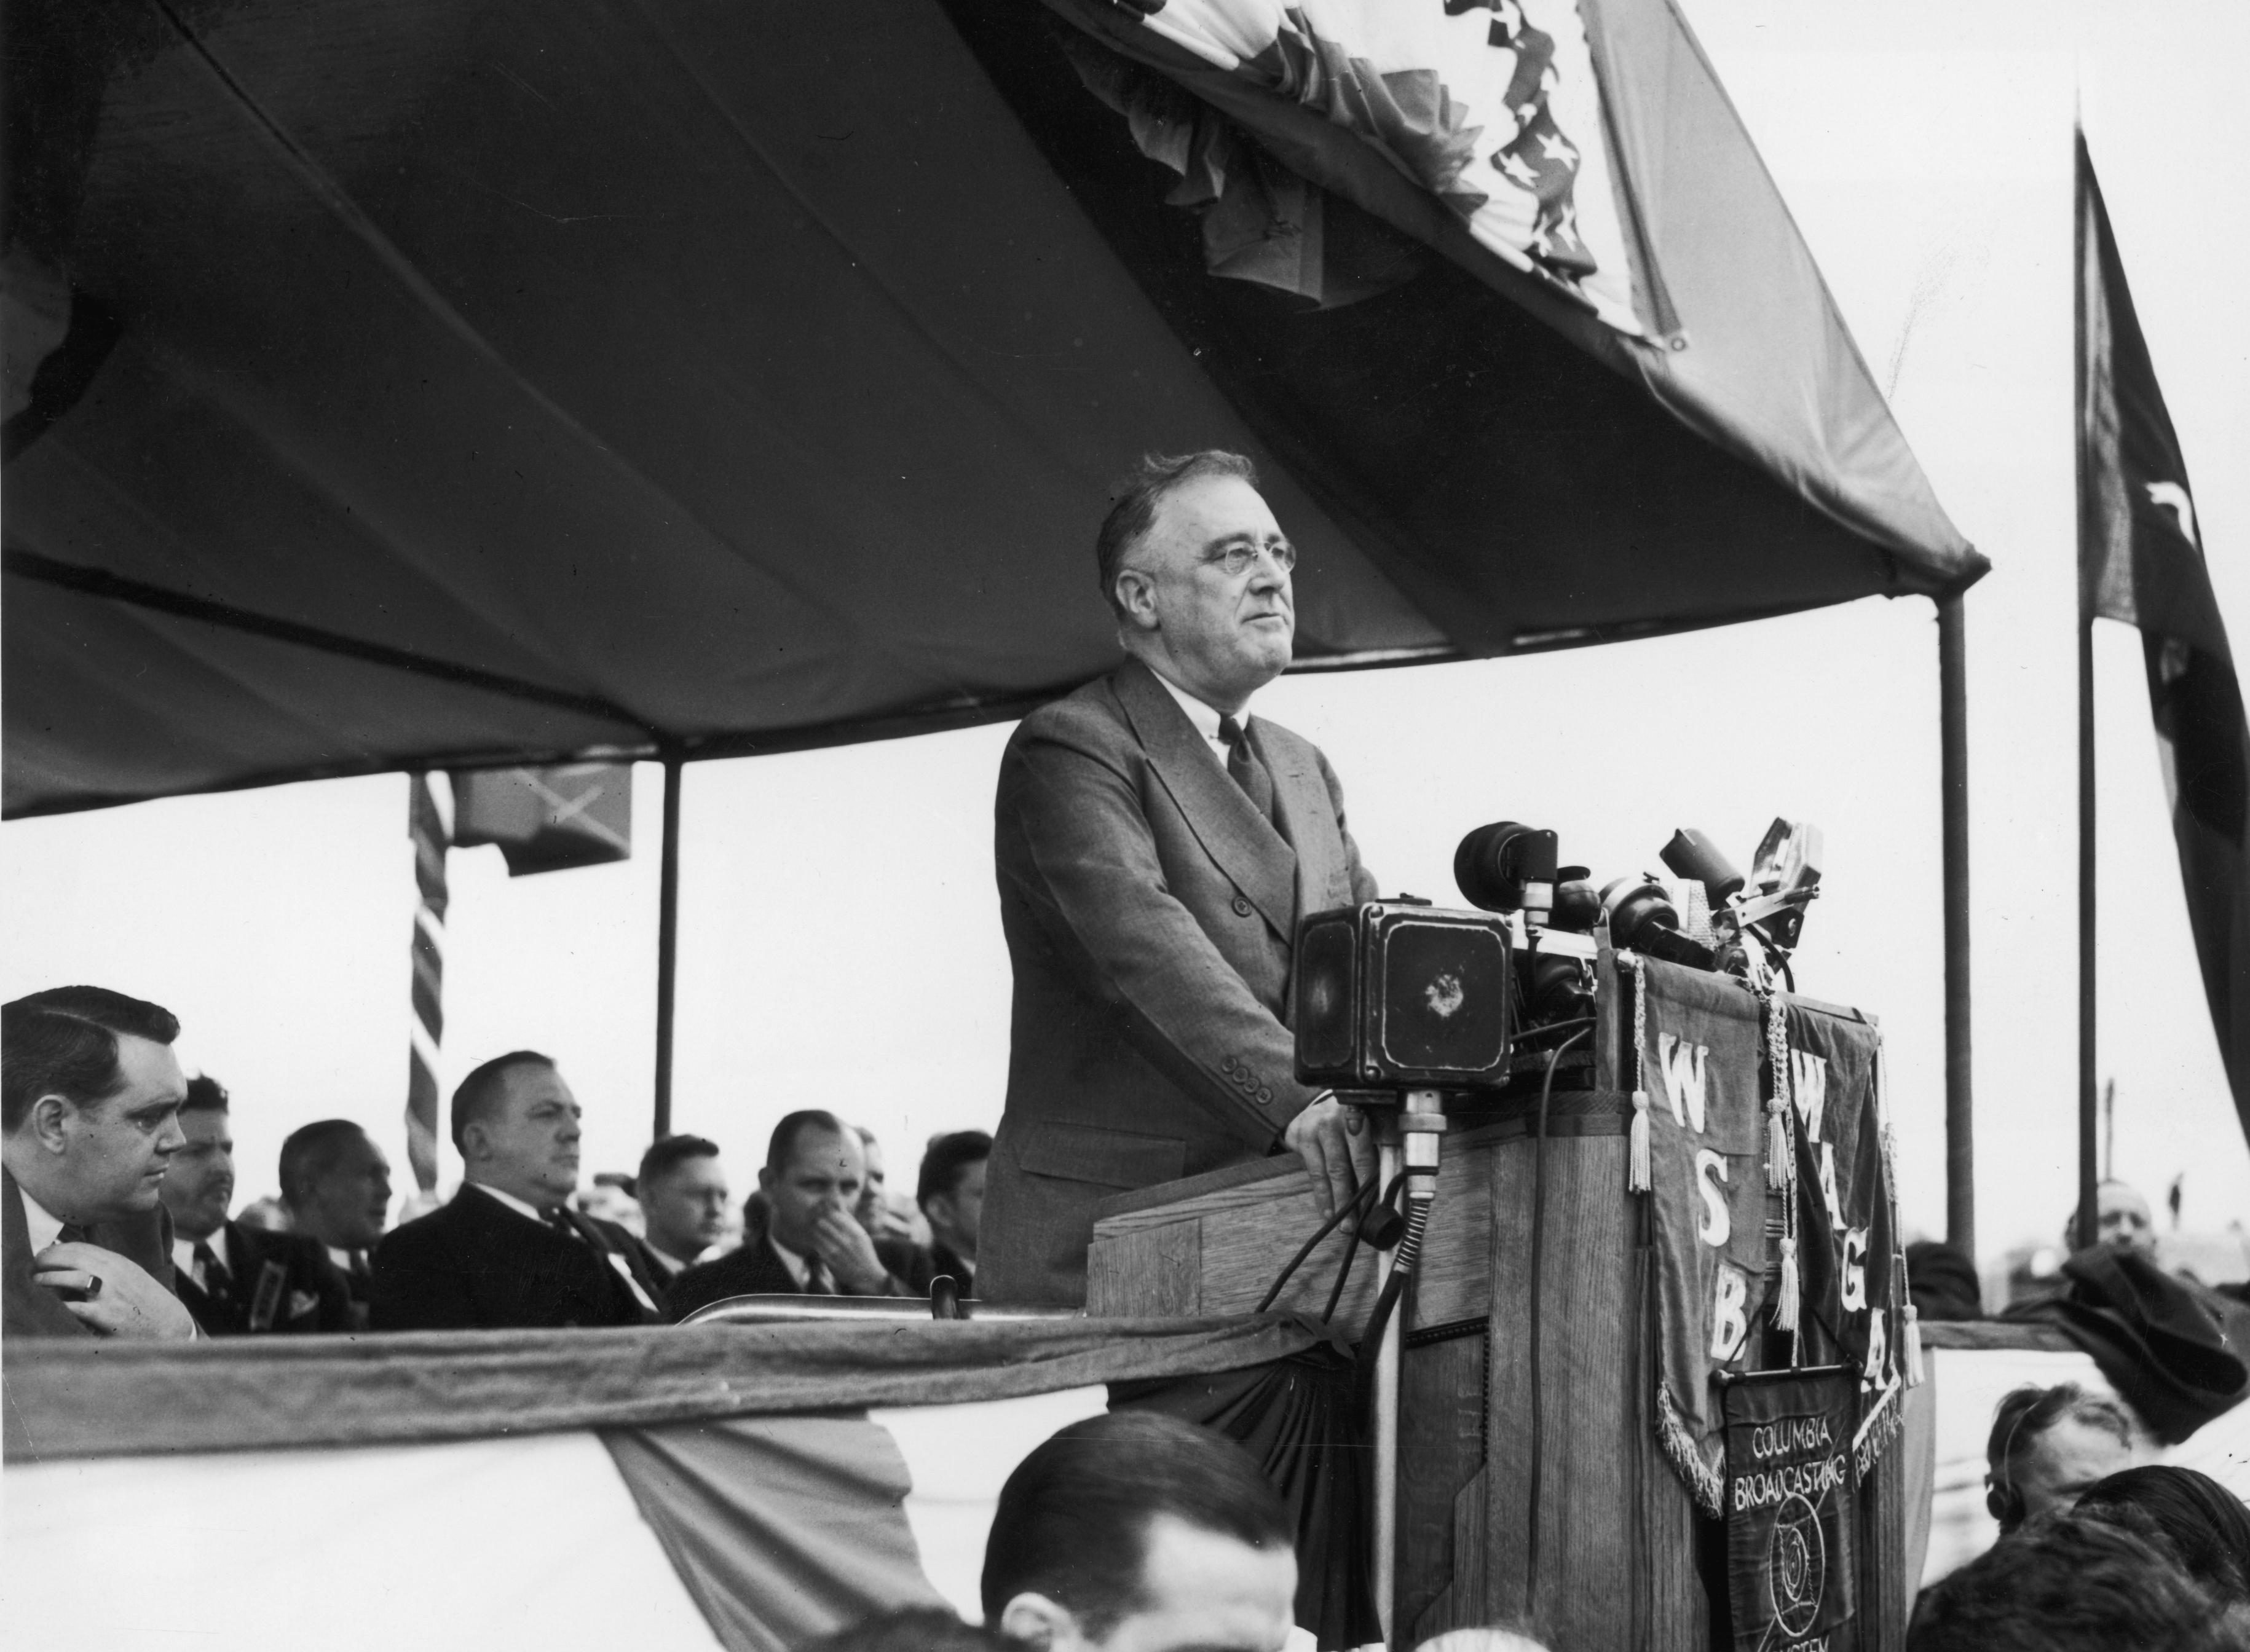 President Franklin Delano Roosevelt speaks at the dedication of Roosevelt Square in Gainsville, Georgia on March 23, 1938.